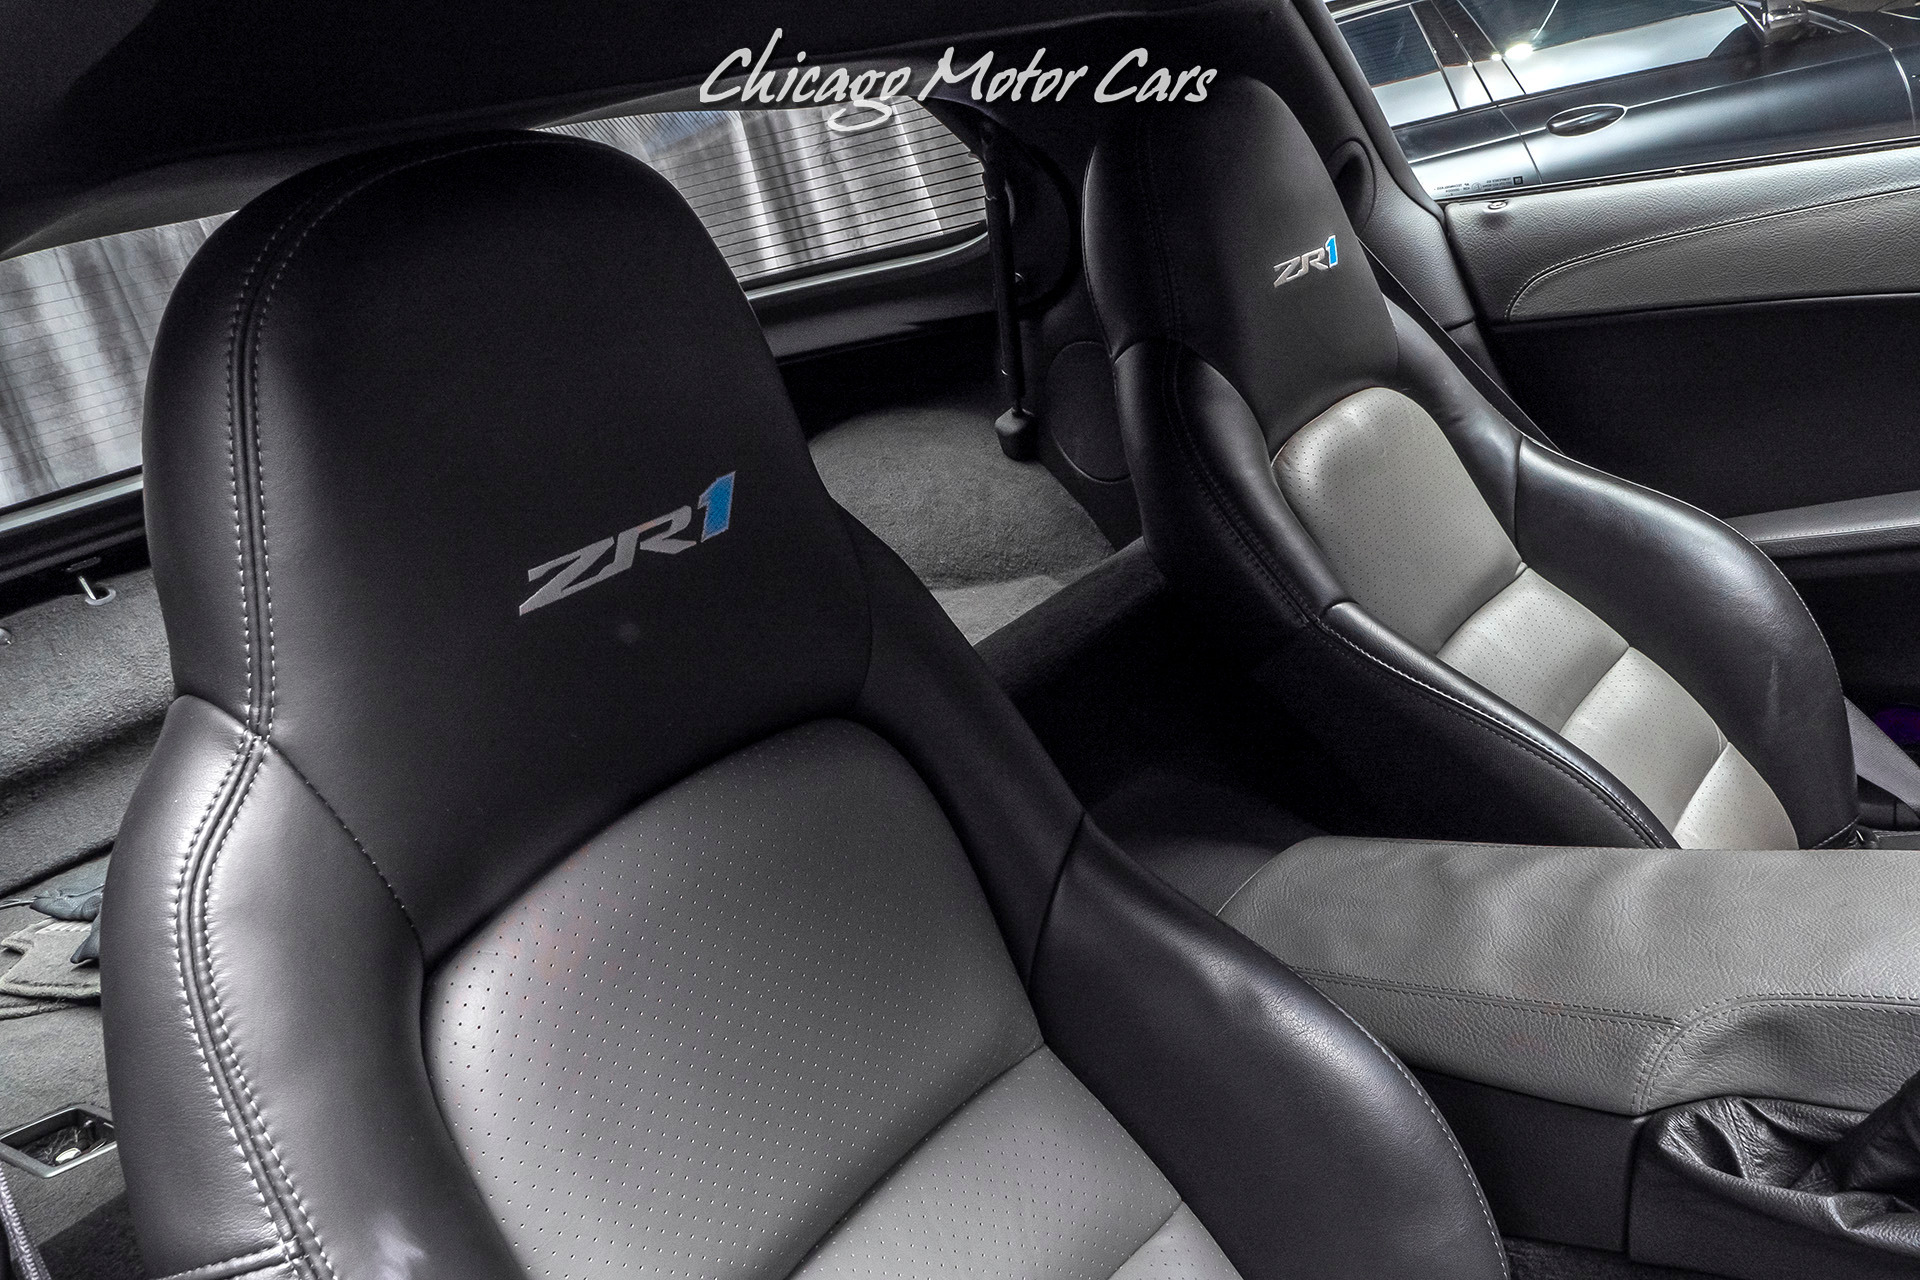 Used-2009-Chevrolet-Corvette-ZR1-FACTORY-SUPERCHARGED-V8-ENGINE-CARBON-FIBER